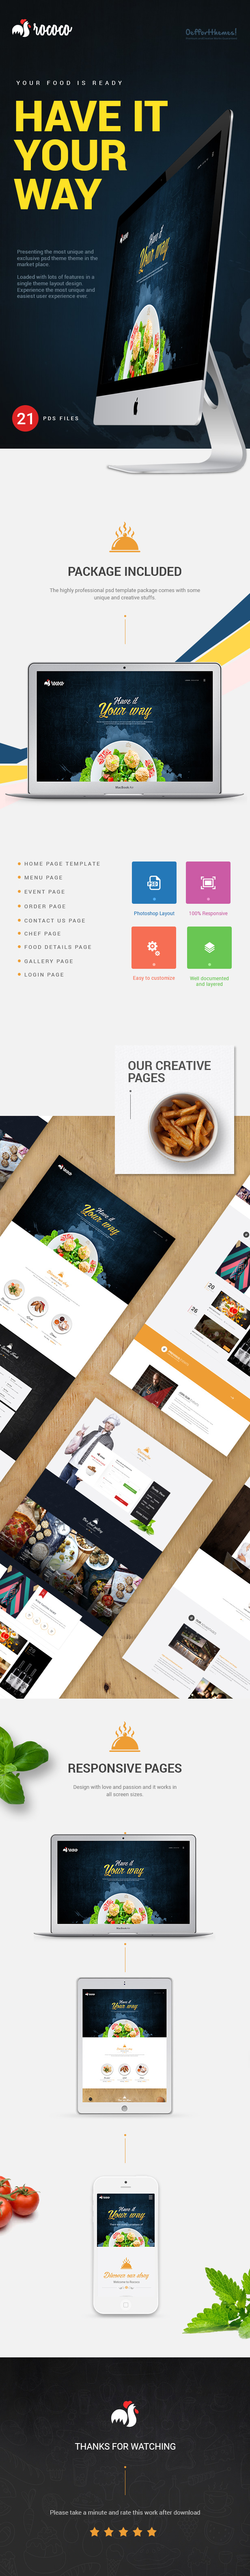 Rococo| Multipurpose Restaurant PSD Template - 2